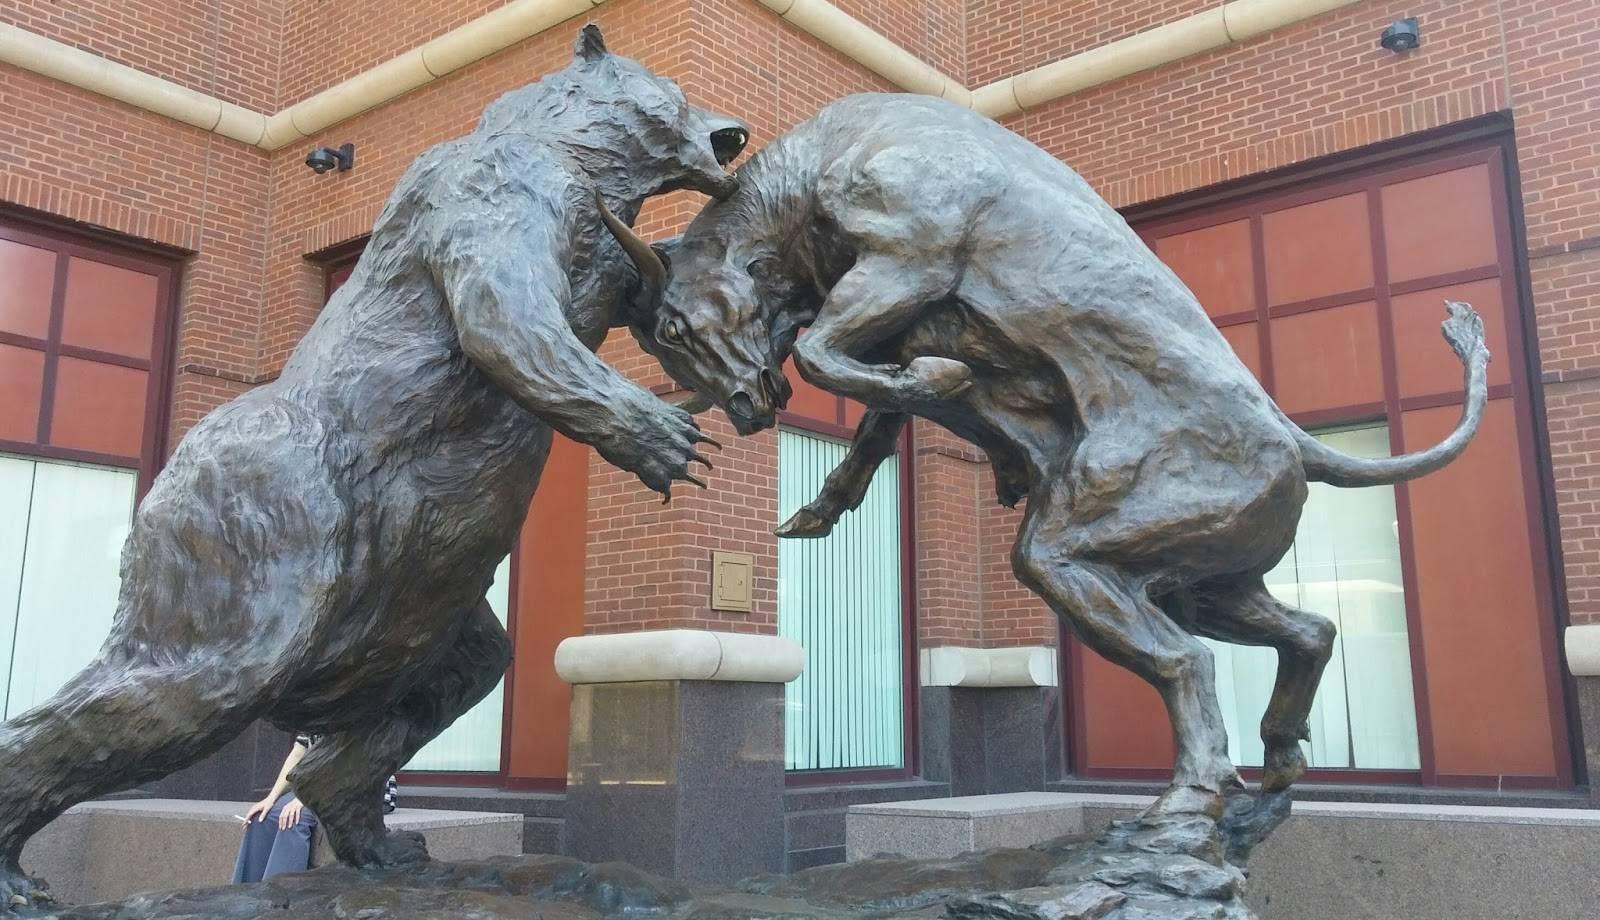 Bulls versus Bears on Wall Street